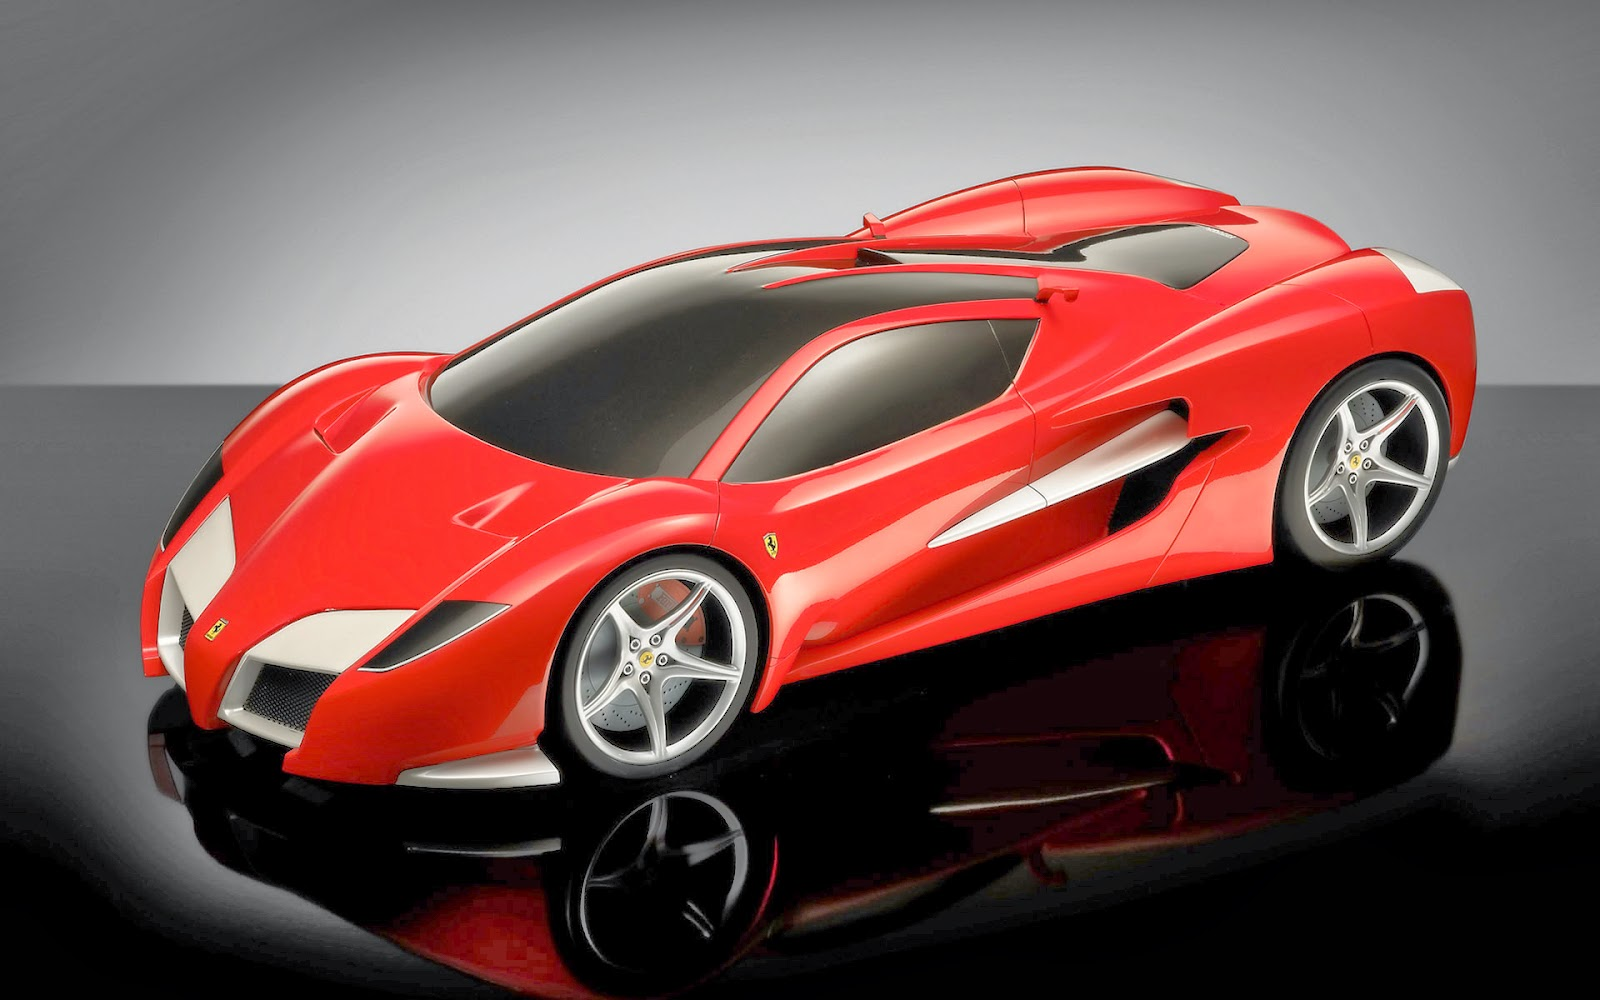 Ferrari car hd pictures free download amazing ferrari - Ferrari hd wallpapers free download ...